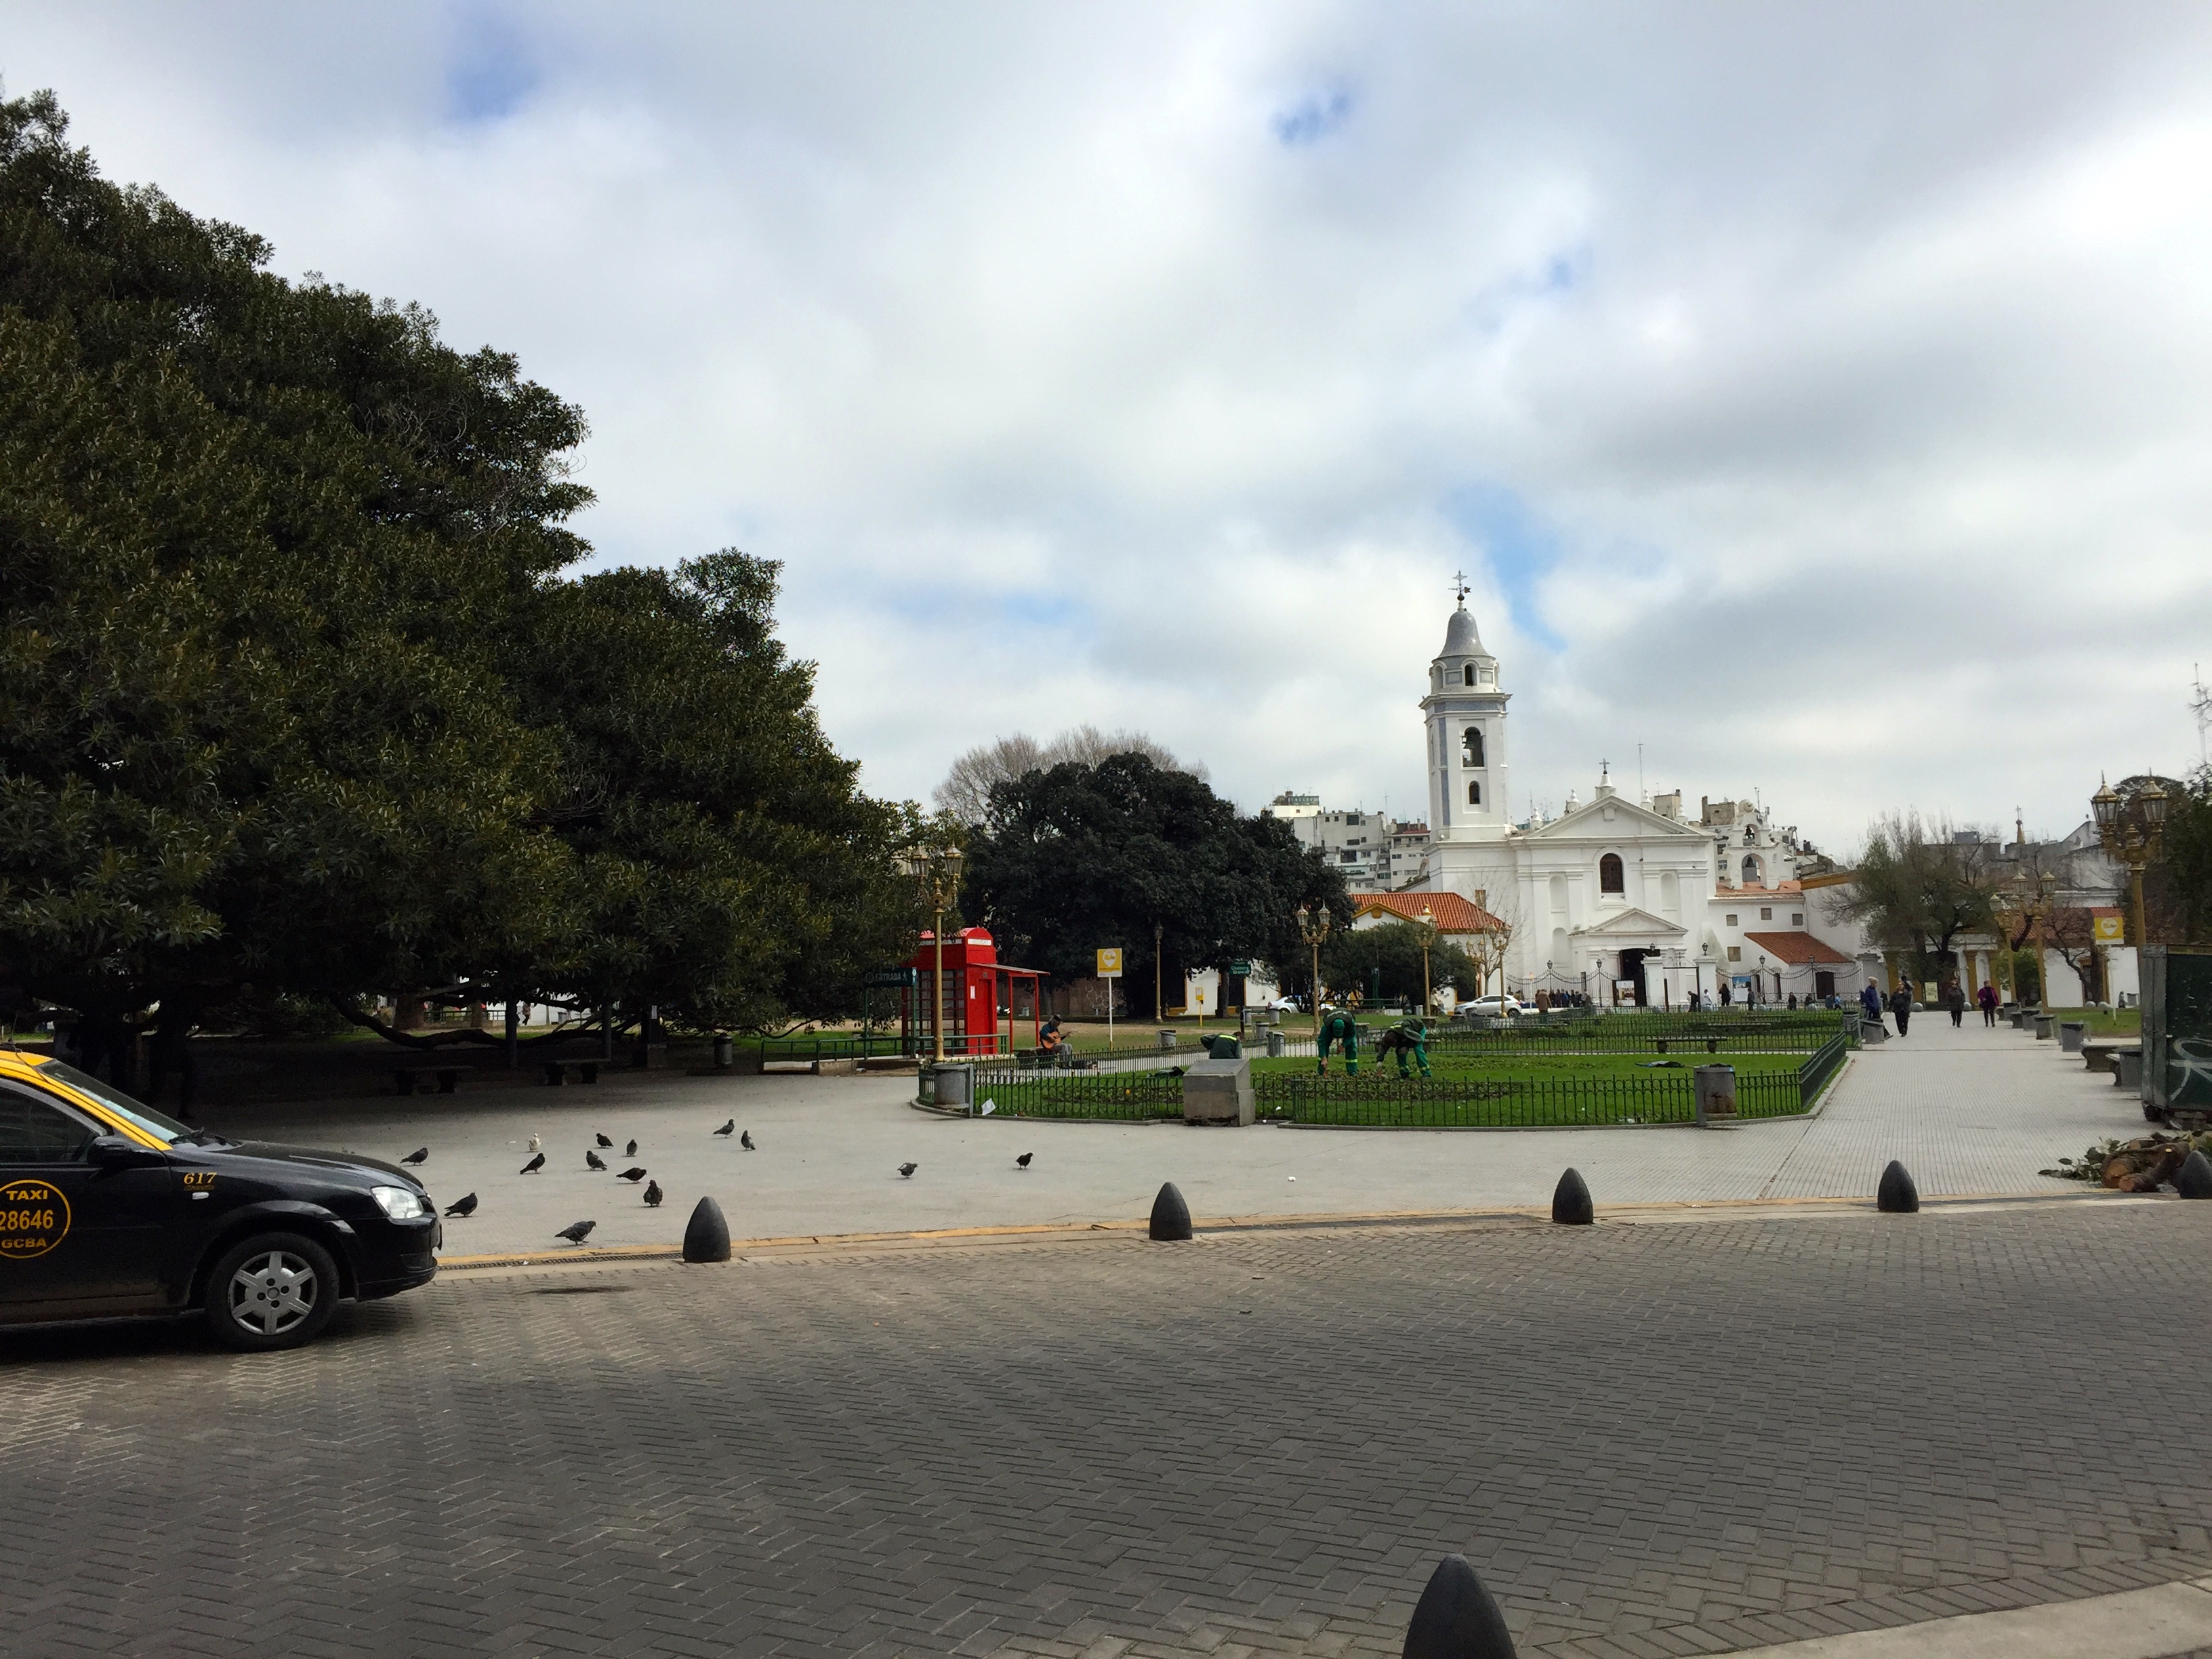 Chelsea Horne/Desperate Times in Argentina